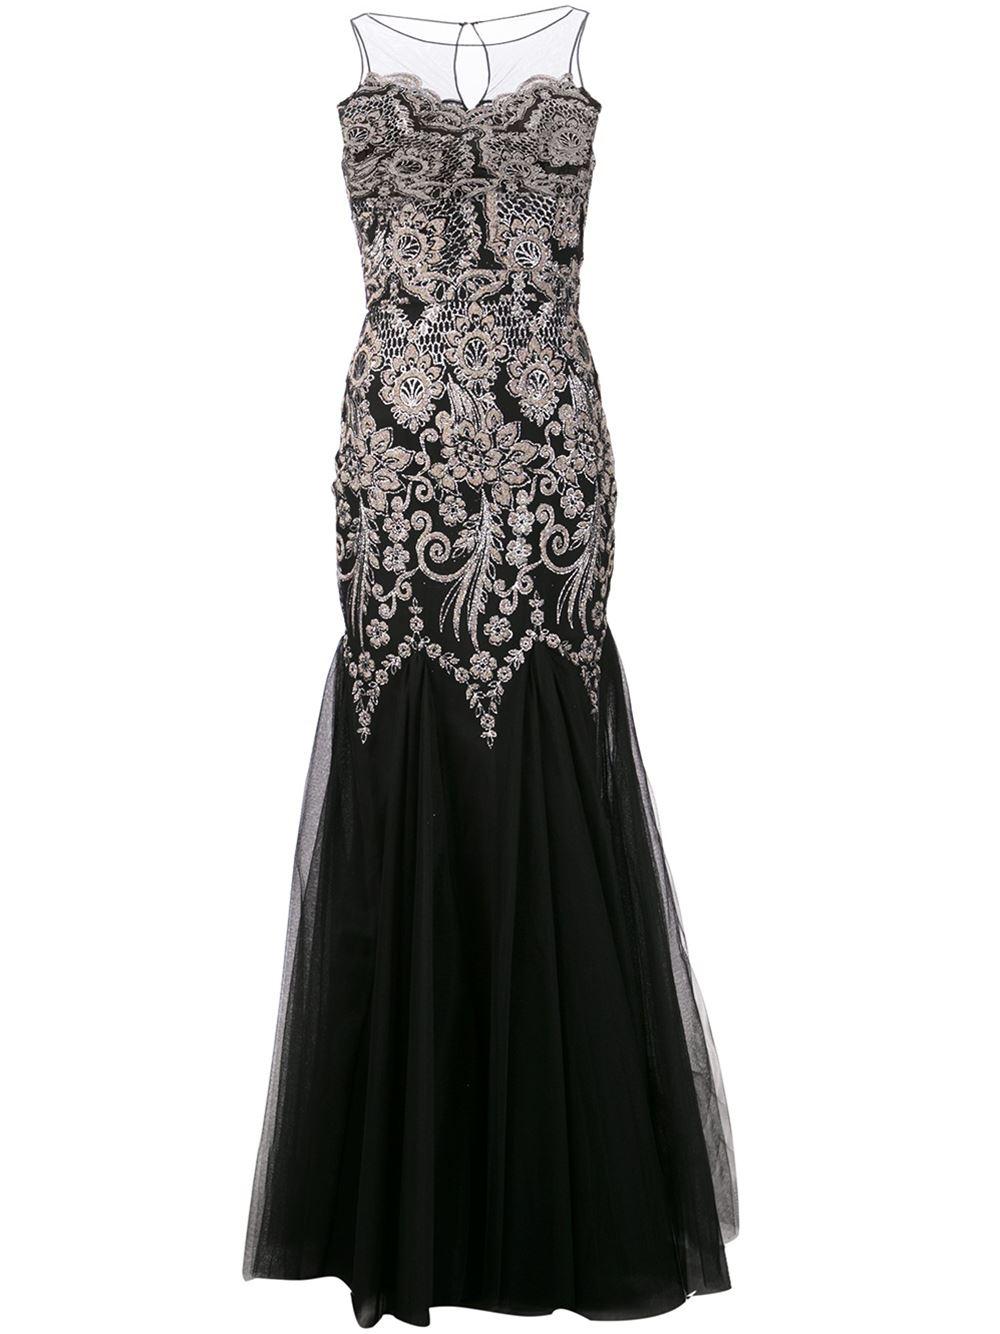 58b3ee93d فستان سهرة أسود من بادجلي ميشكا badgley mischka